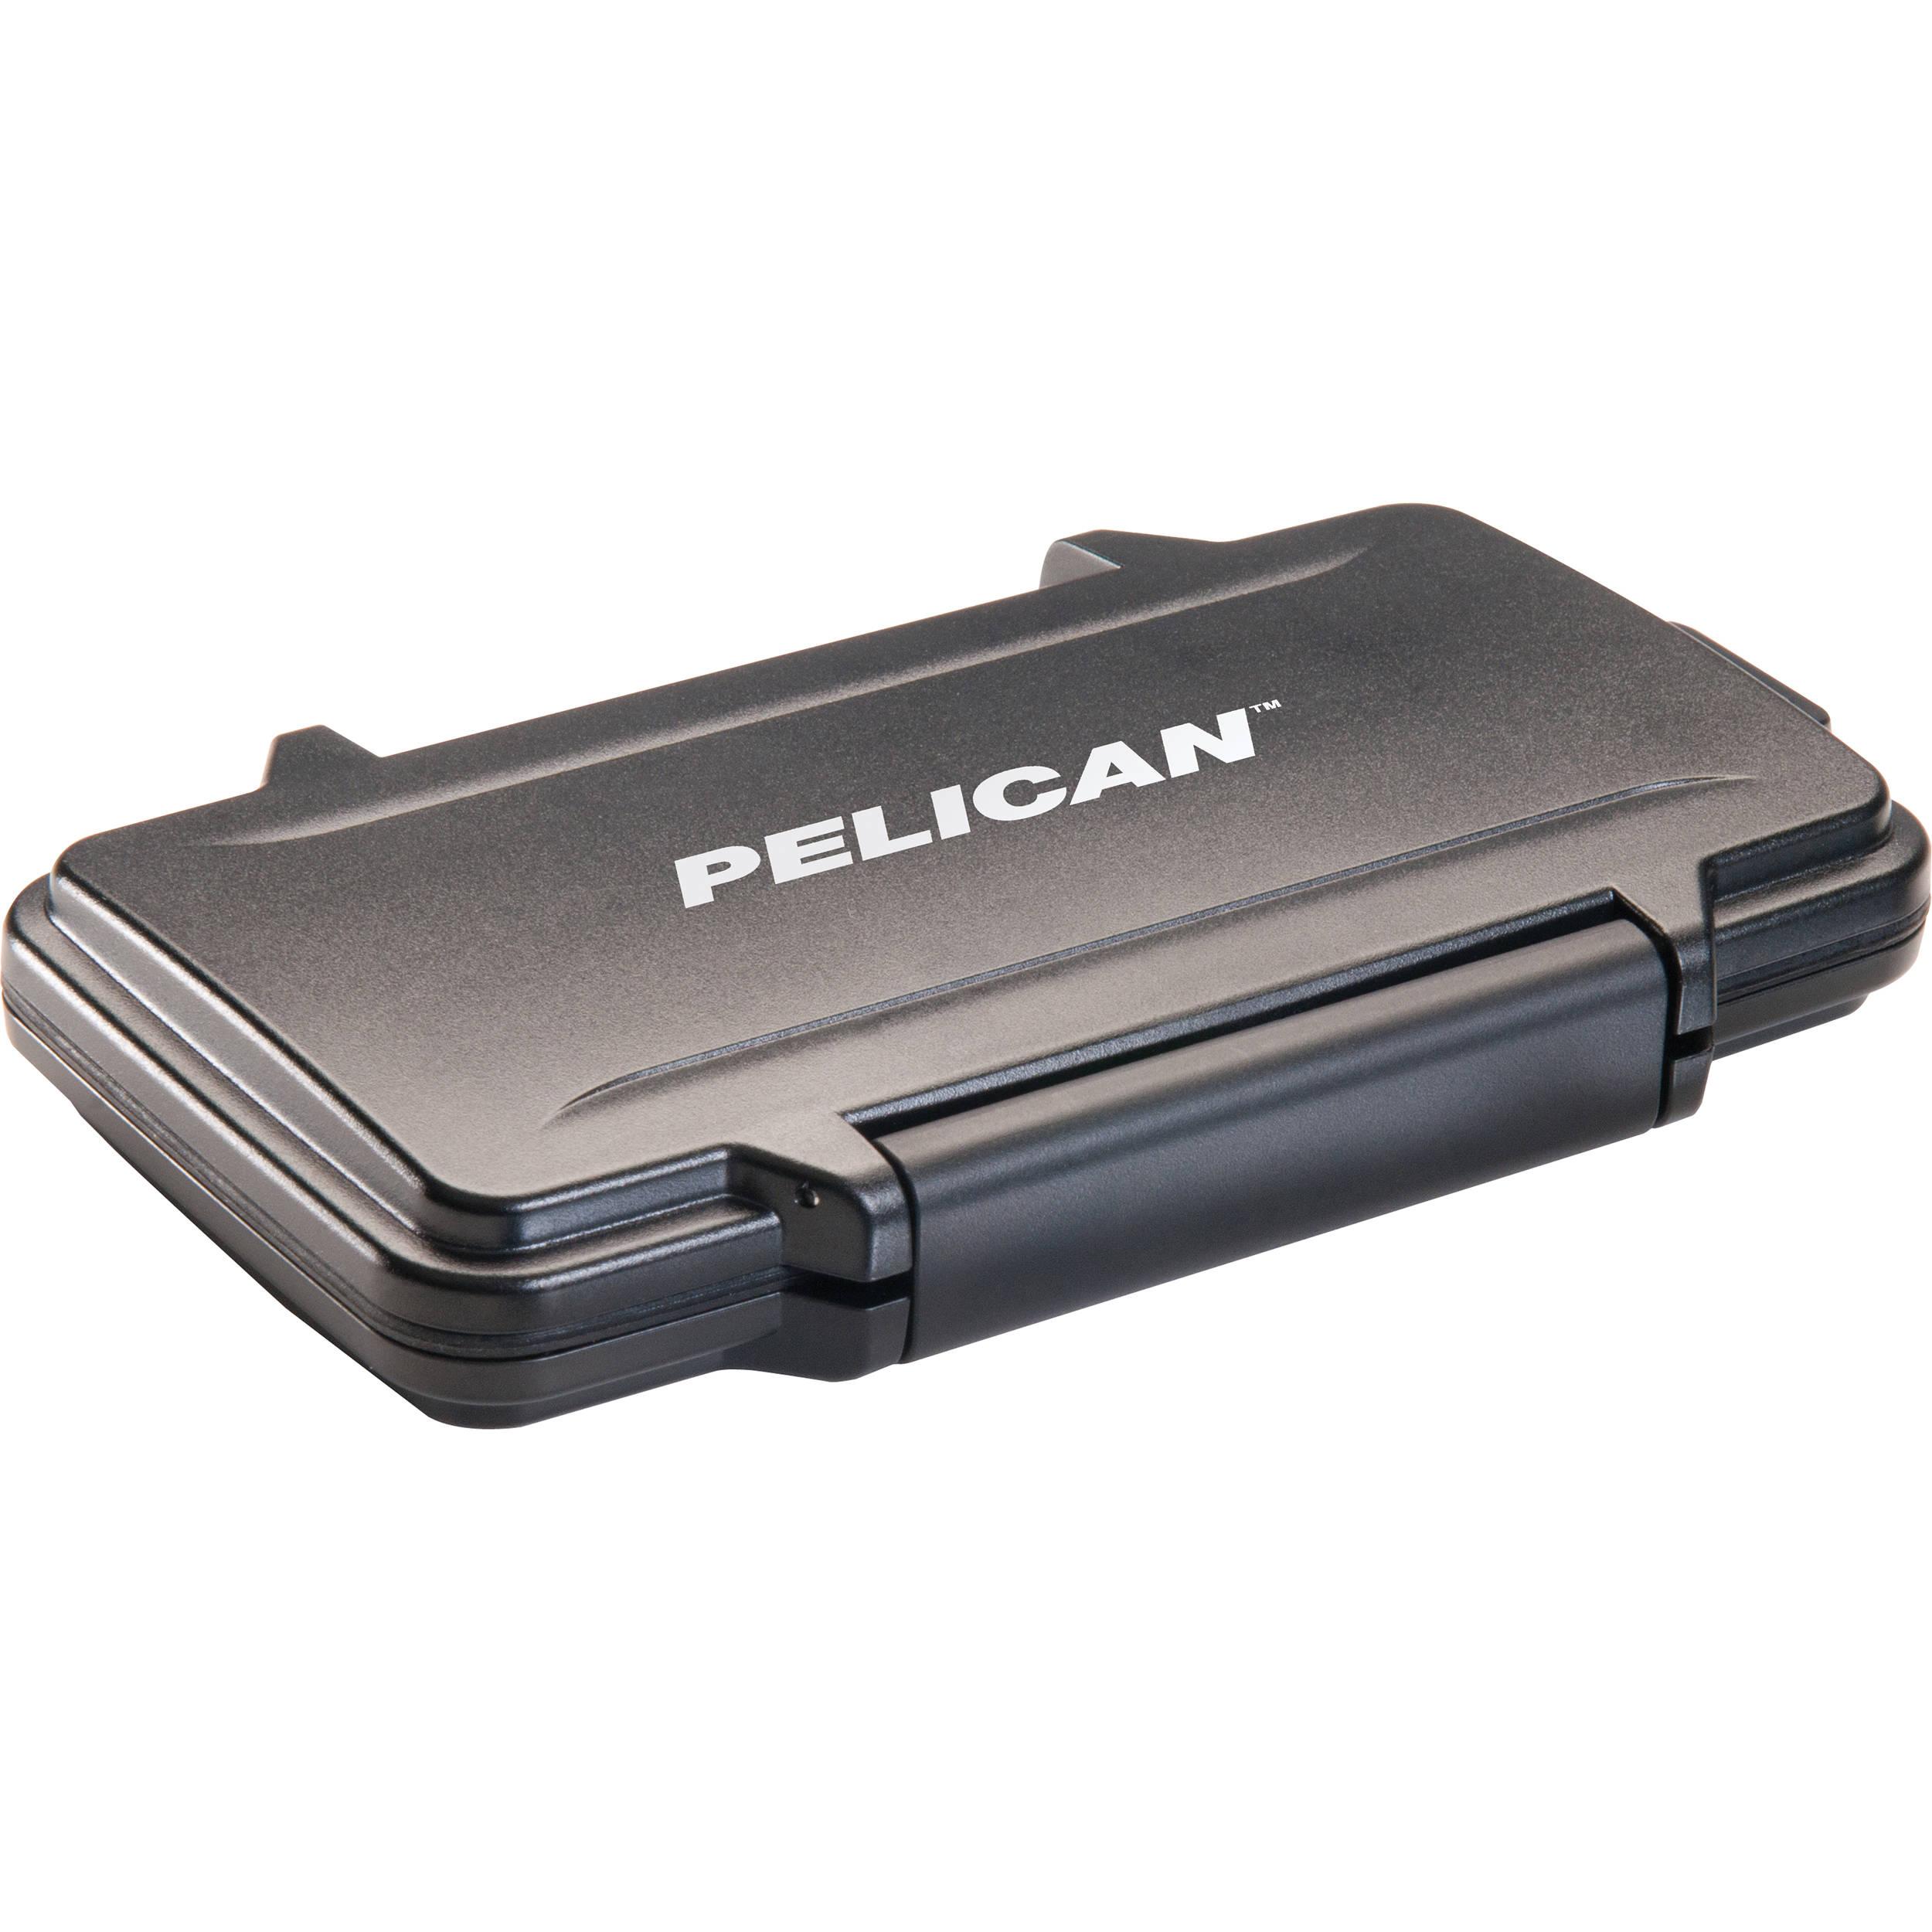 info for 128da 21d45 Pelican 0915 Memory Card Case for 12 SD, 6 miniSD, and 6 microSD Cards  (Black)